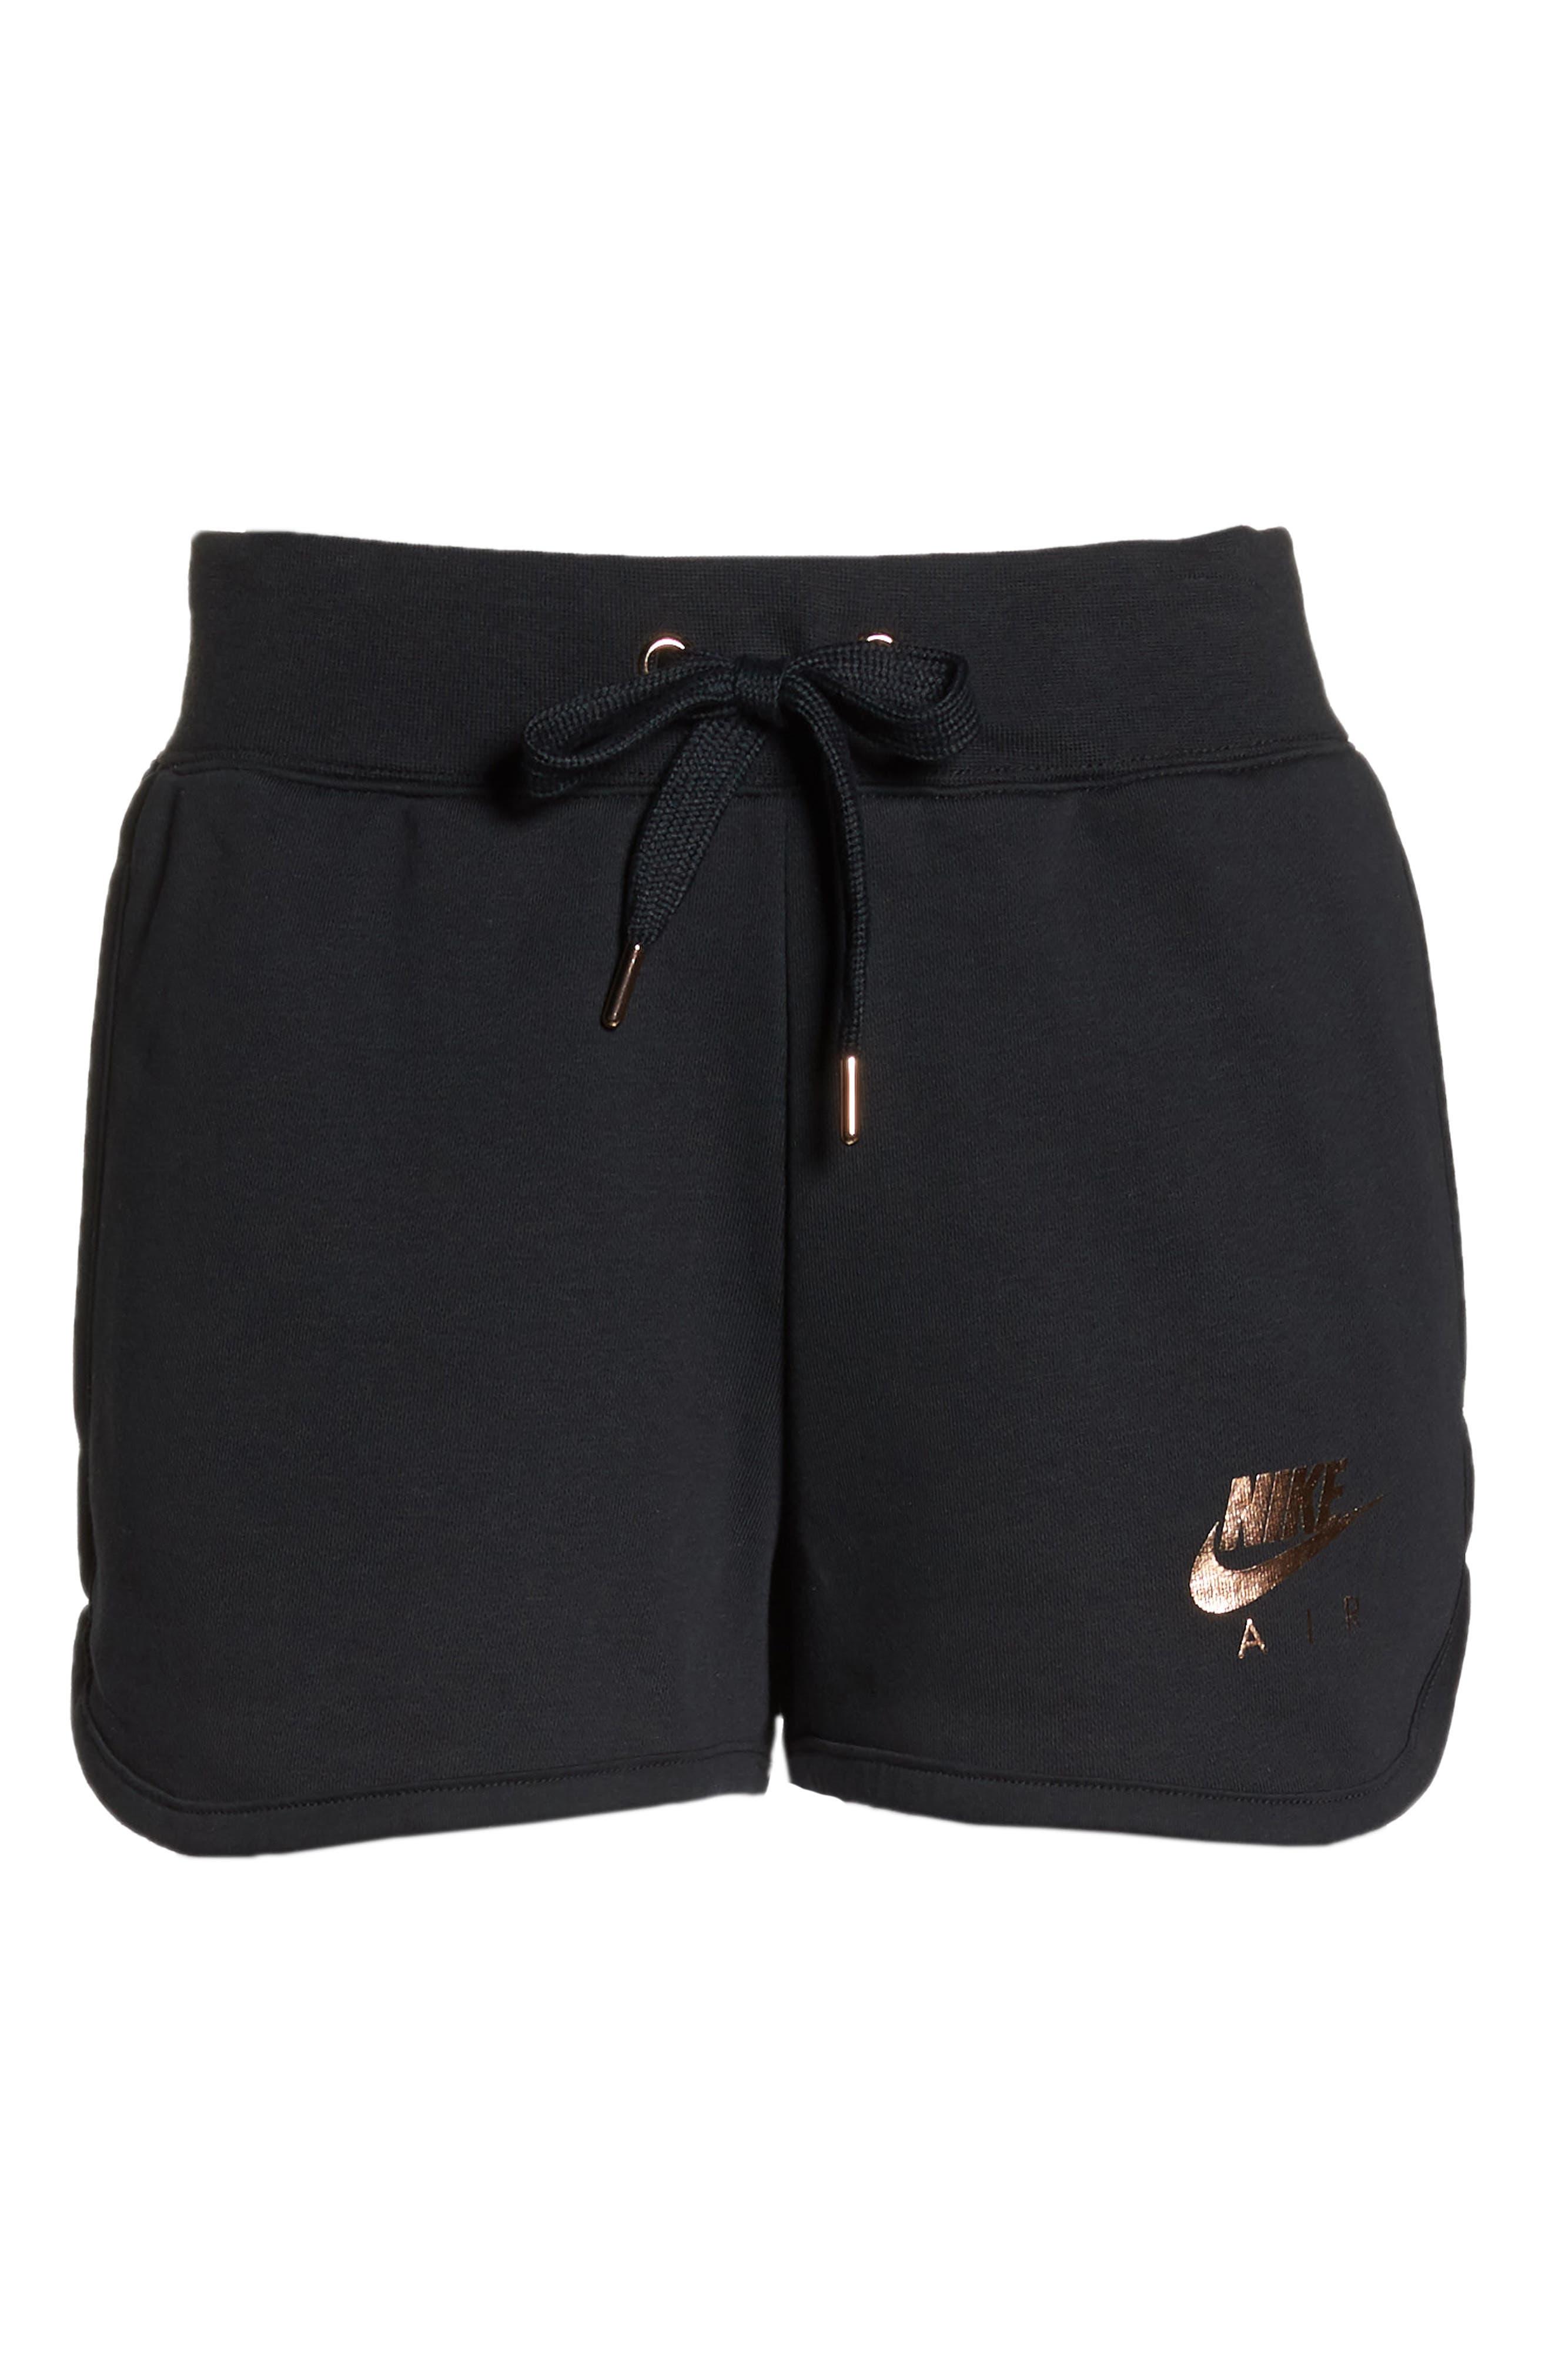 Sportswear Air Shorts,                             Alternate thumbnail 7, color,                             010